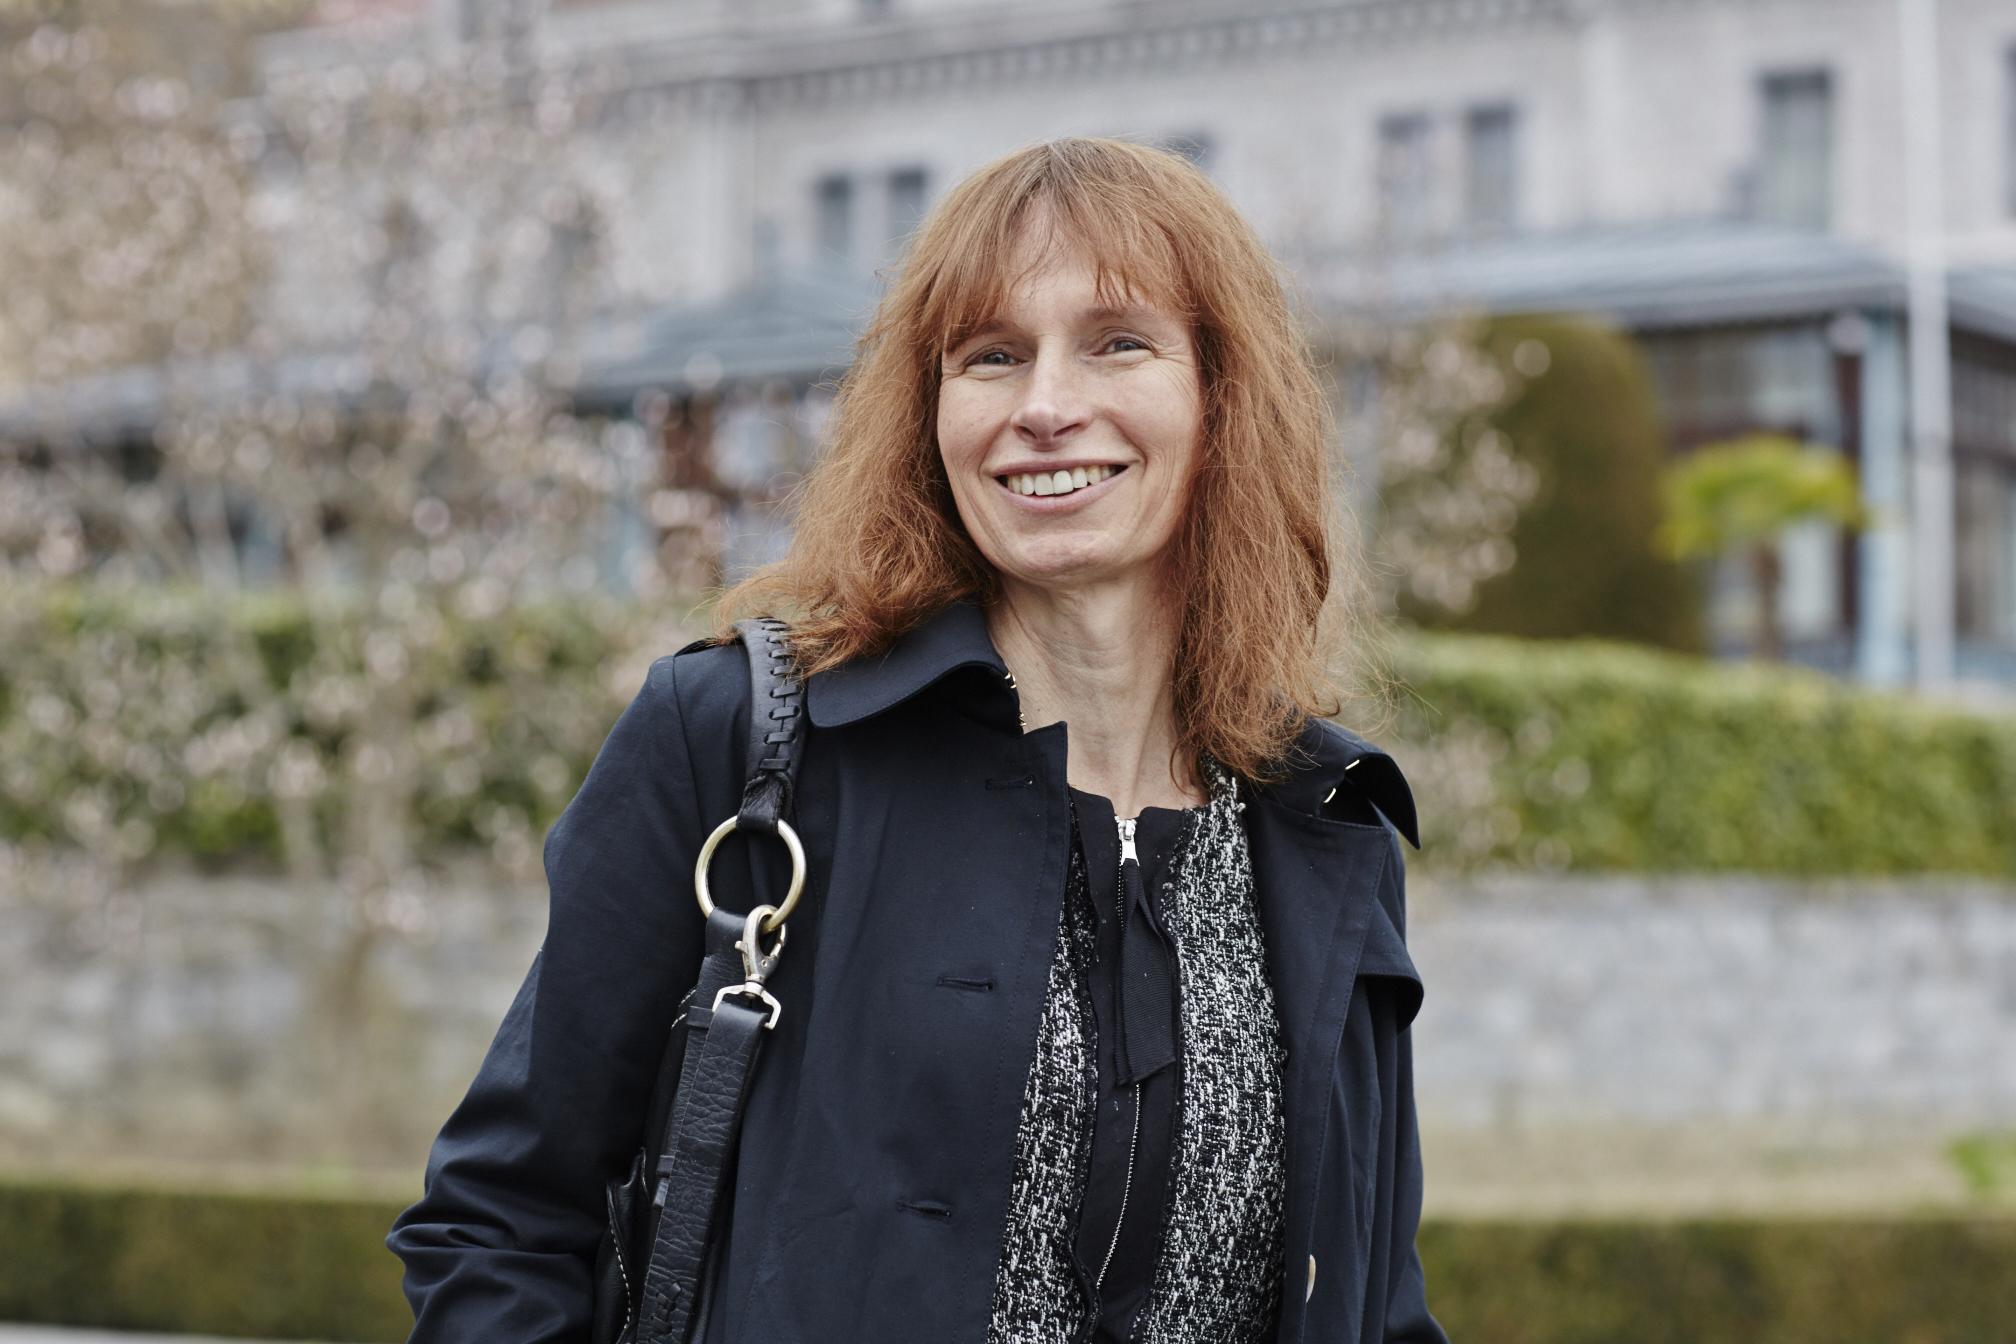 Joanna Harper in Lausanne, Switzerland on March 26, 2015.